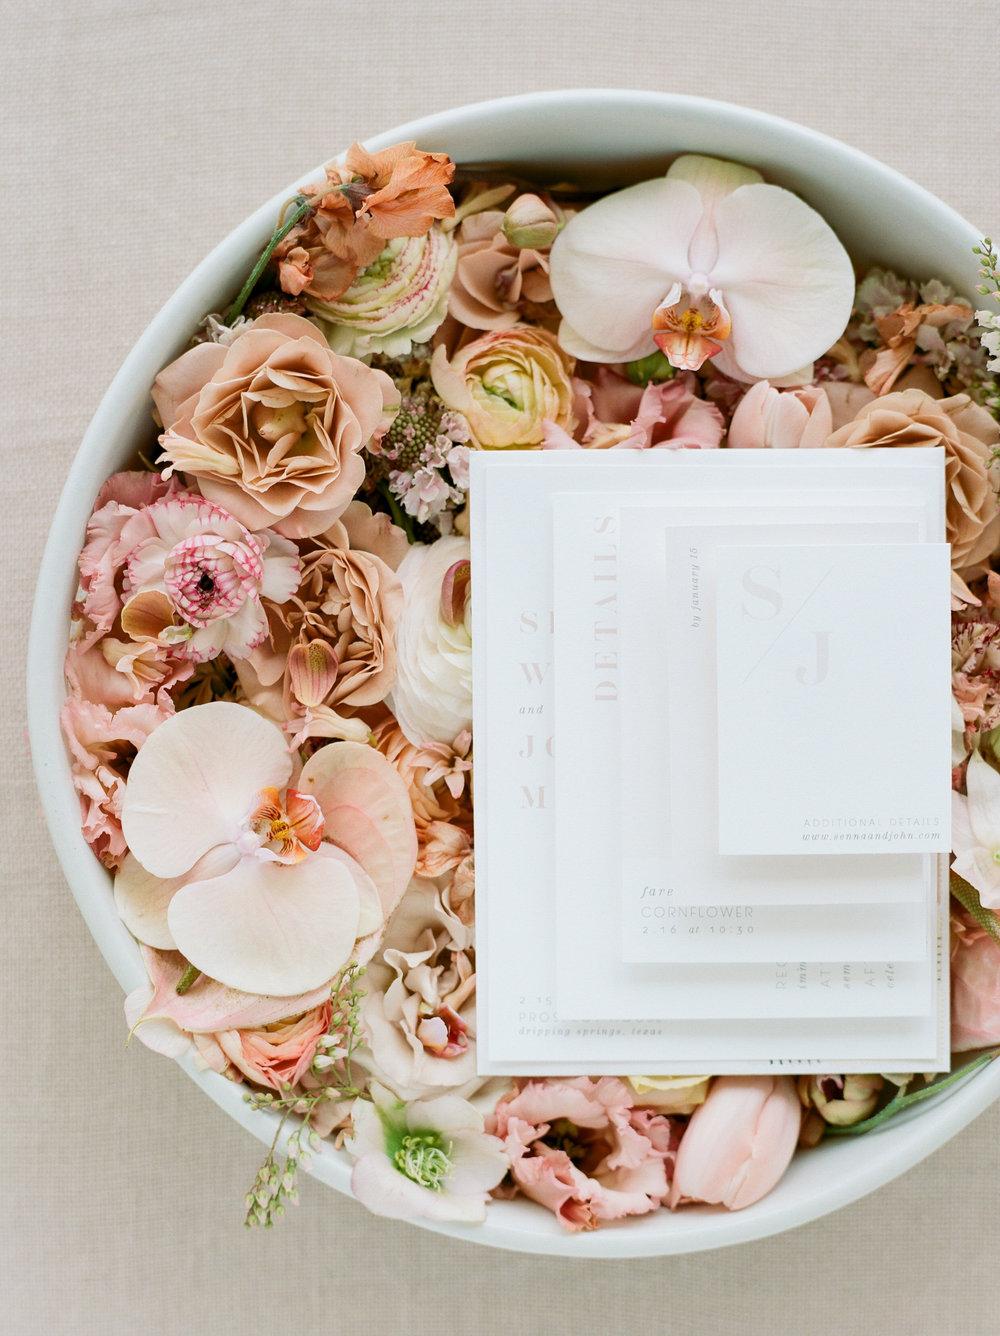 Austin-Wedding-Photography-Prospect-House-Fine-Art-Film-Destination-Dana-Josh-Fernandez-Photography-Dallas-Houston-Luxury-Best-Top-2.jpg